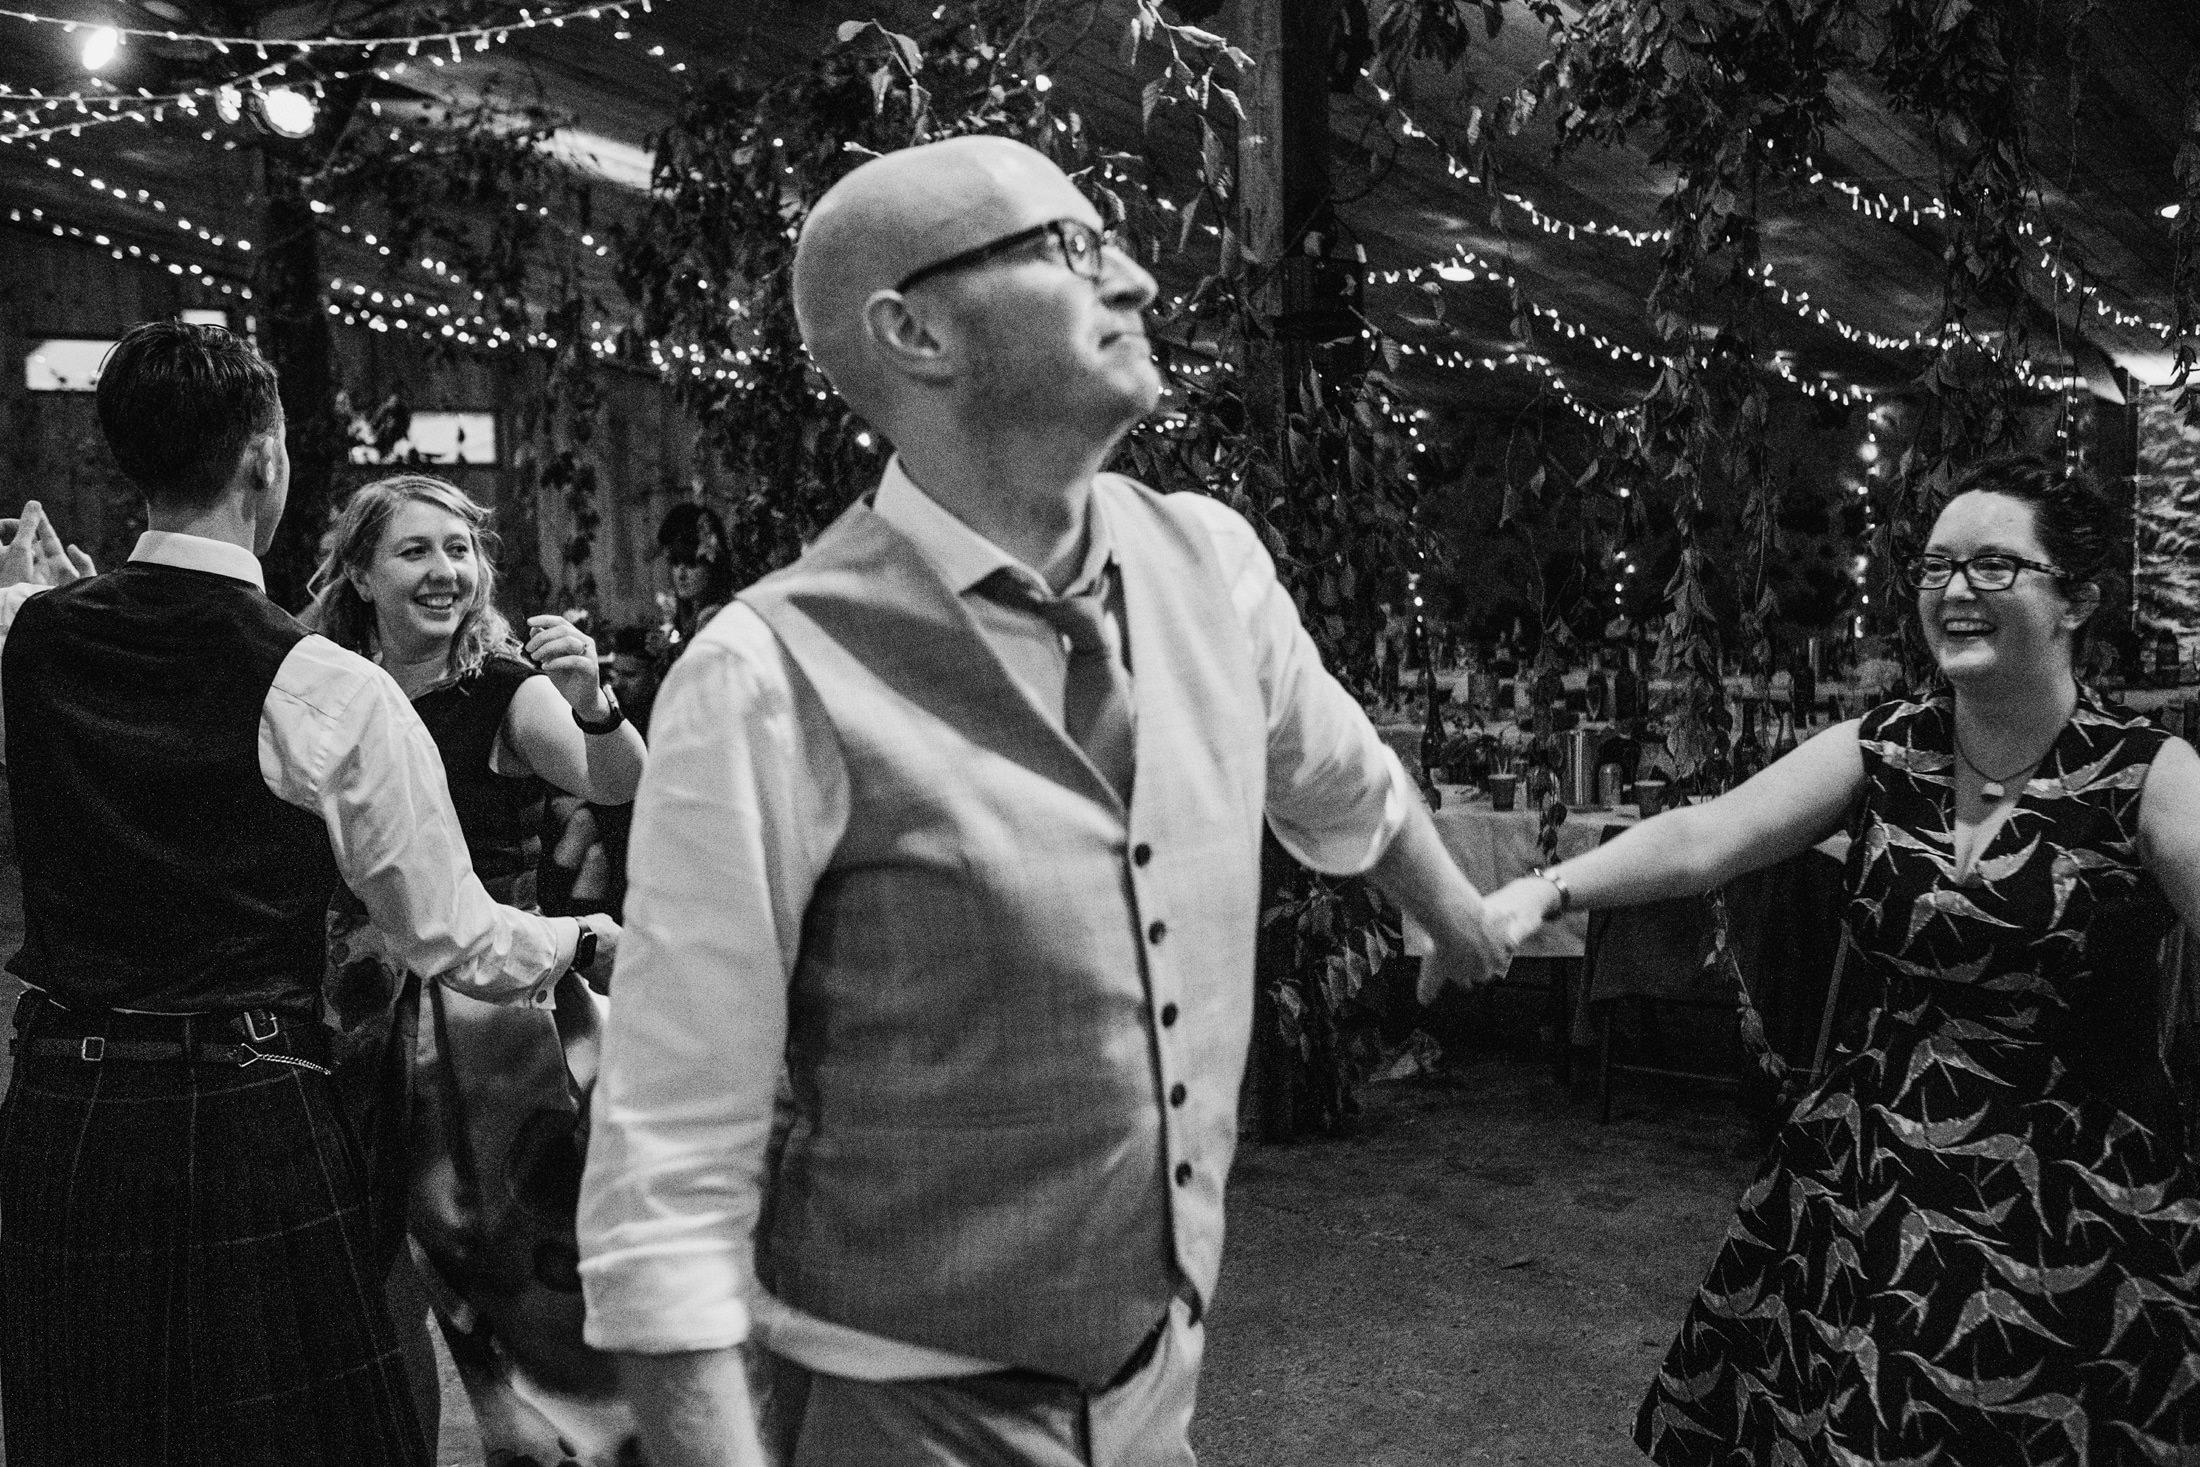 wedding guests dancing at Comrie Croft